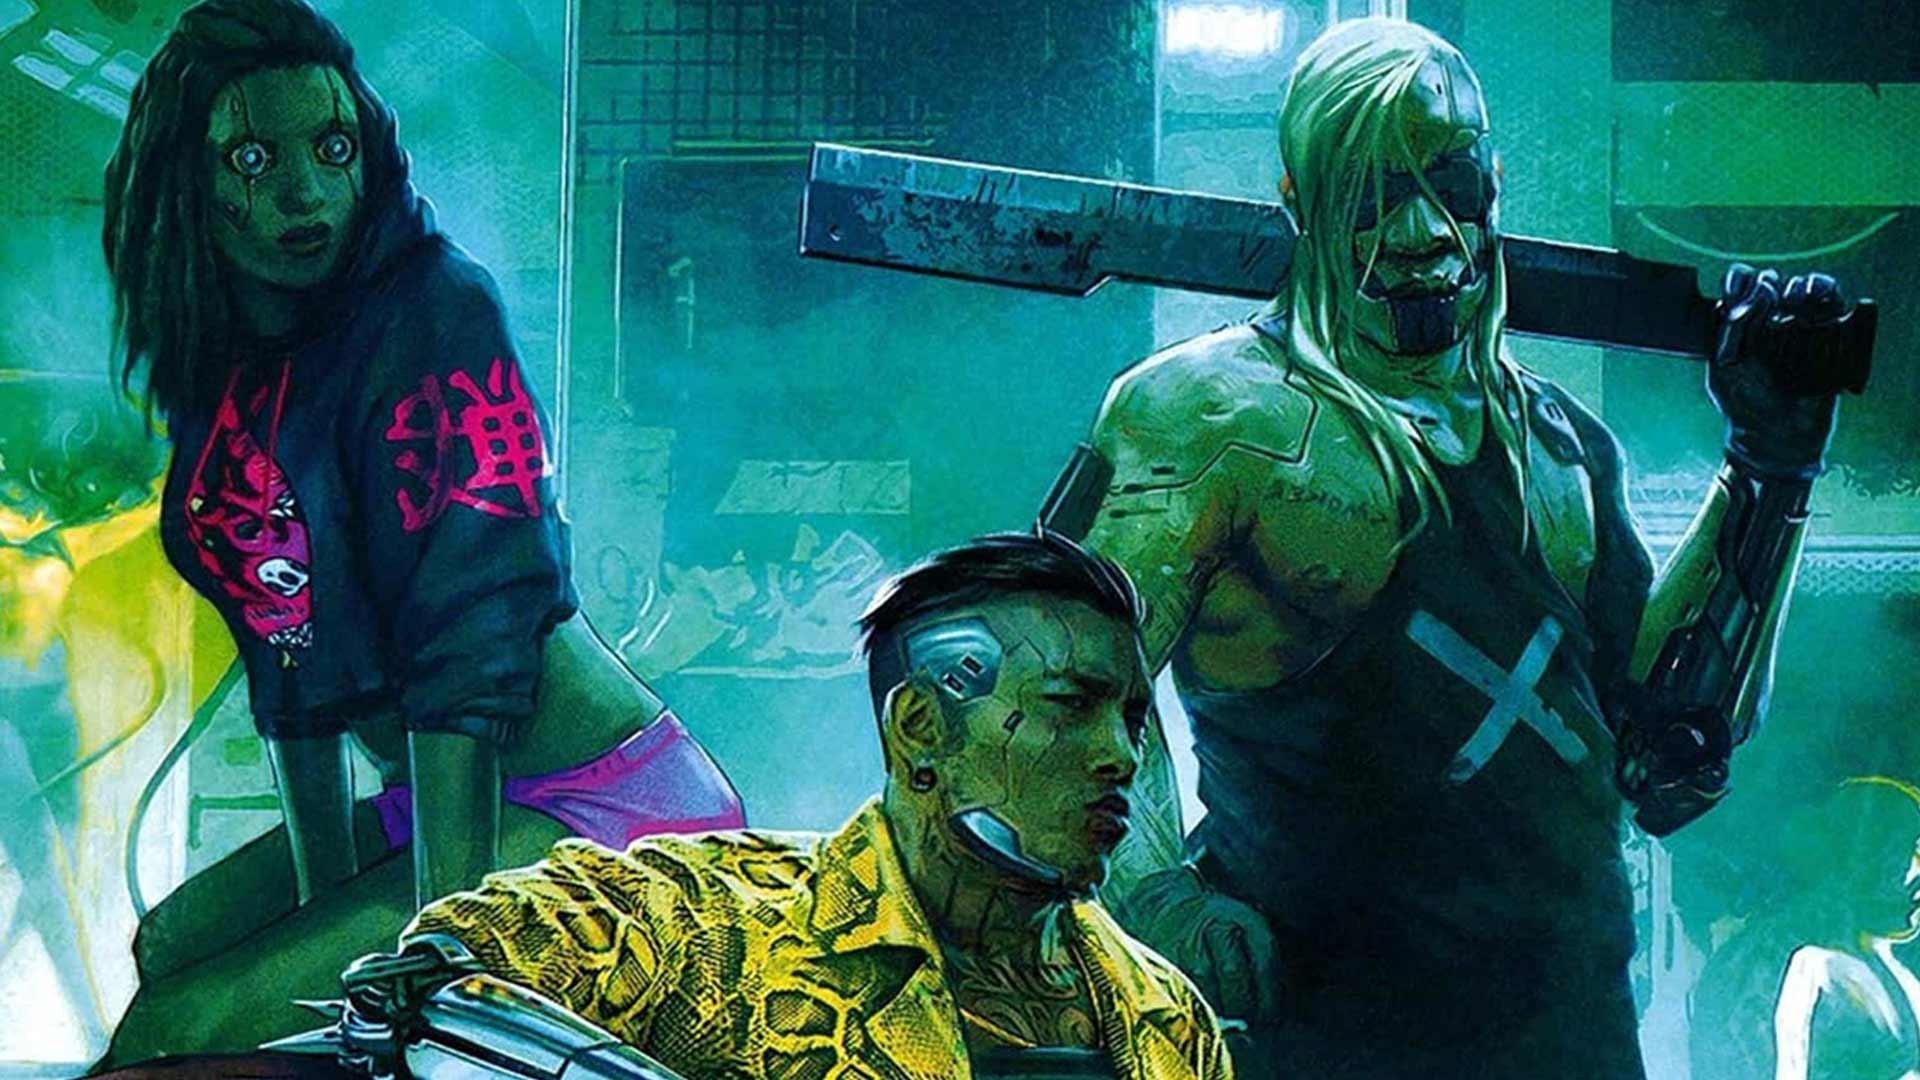 Какие последние новости о Cyberpunk 2077?